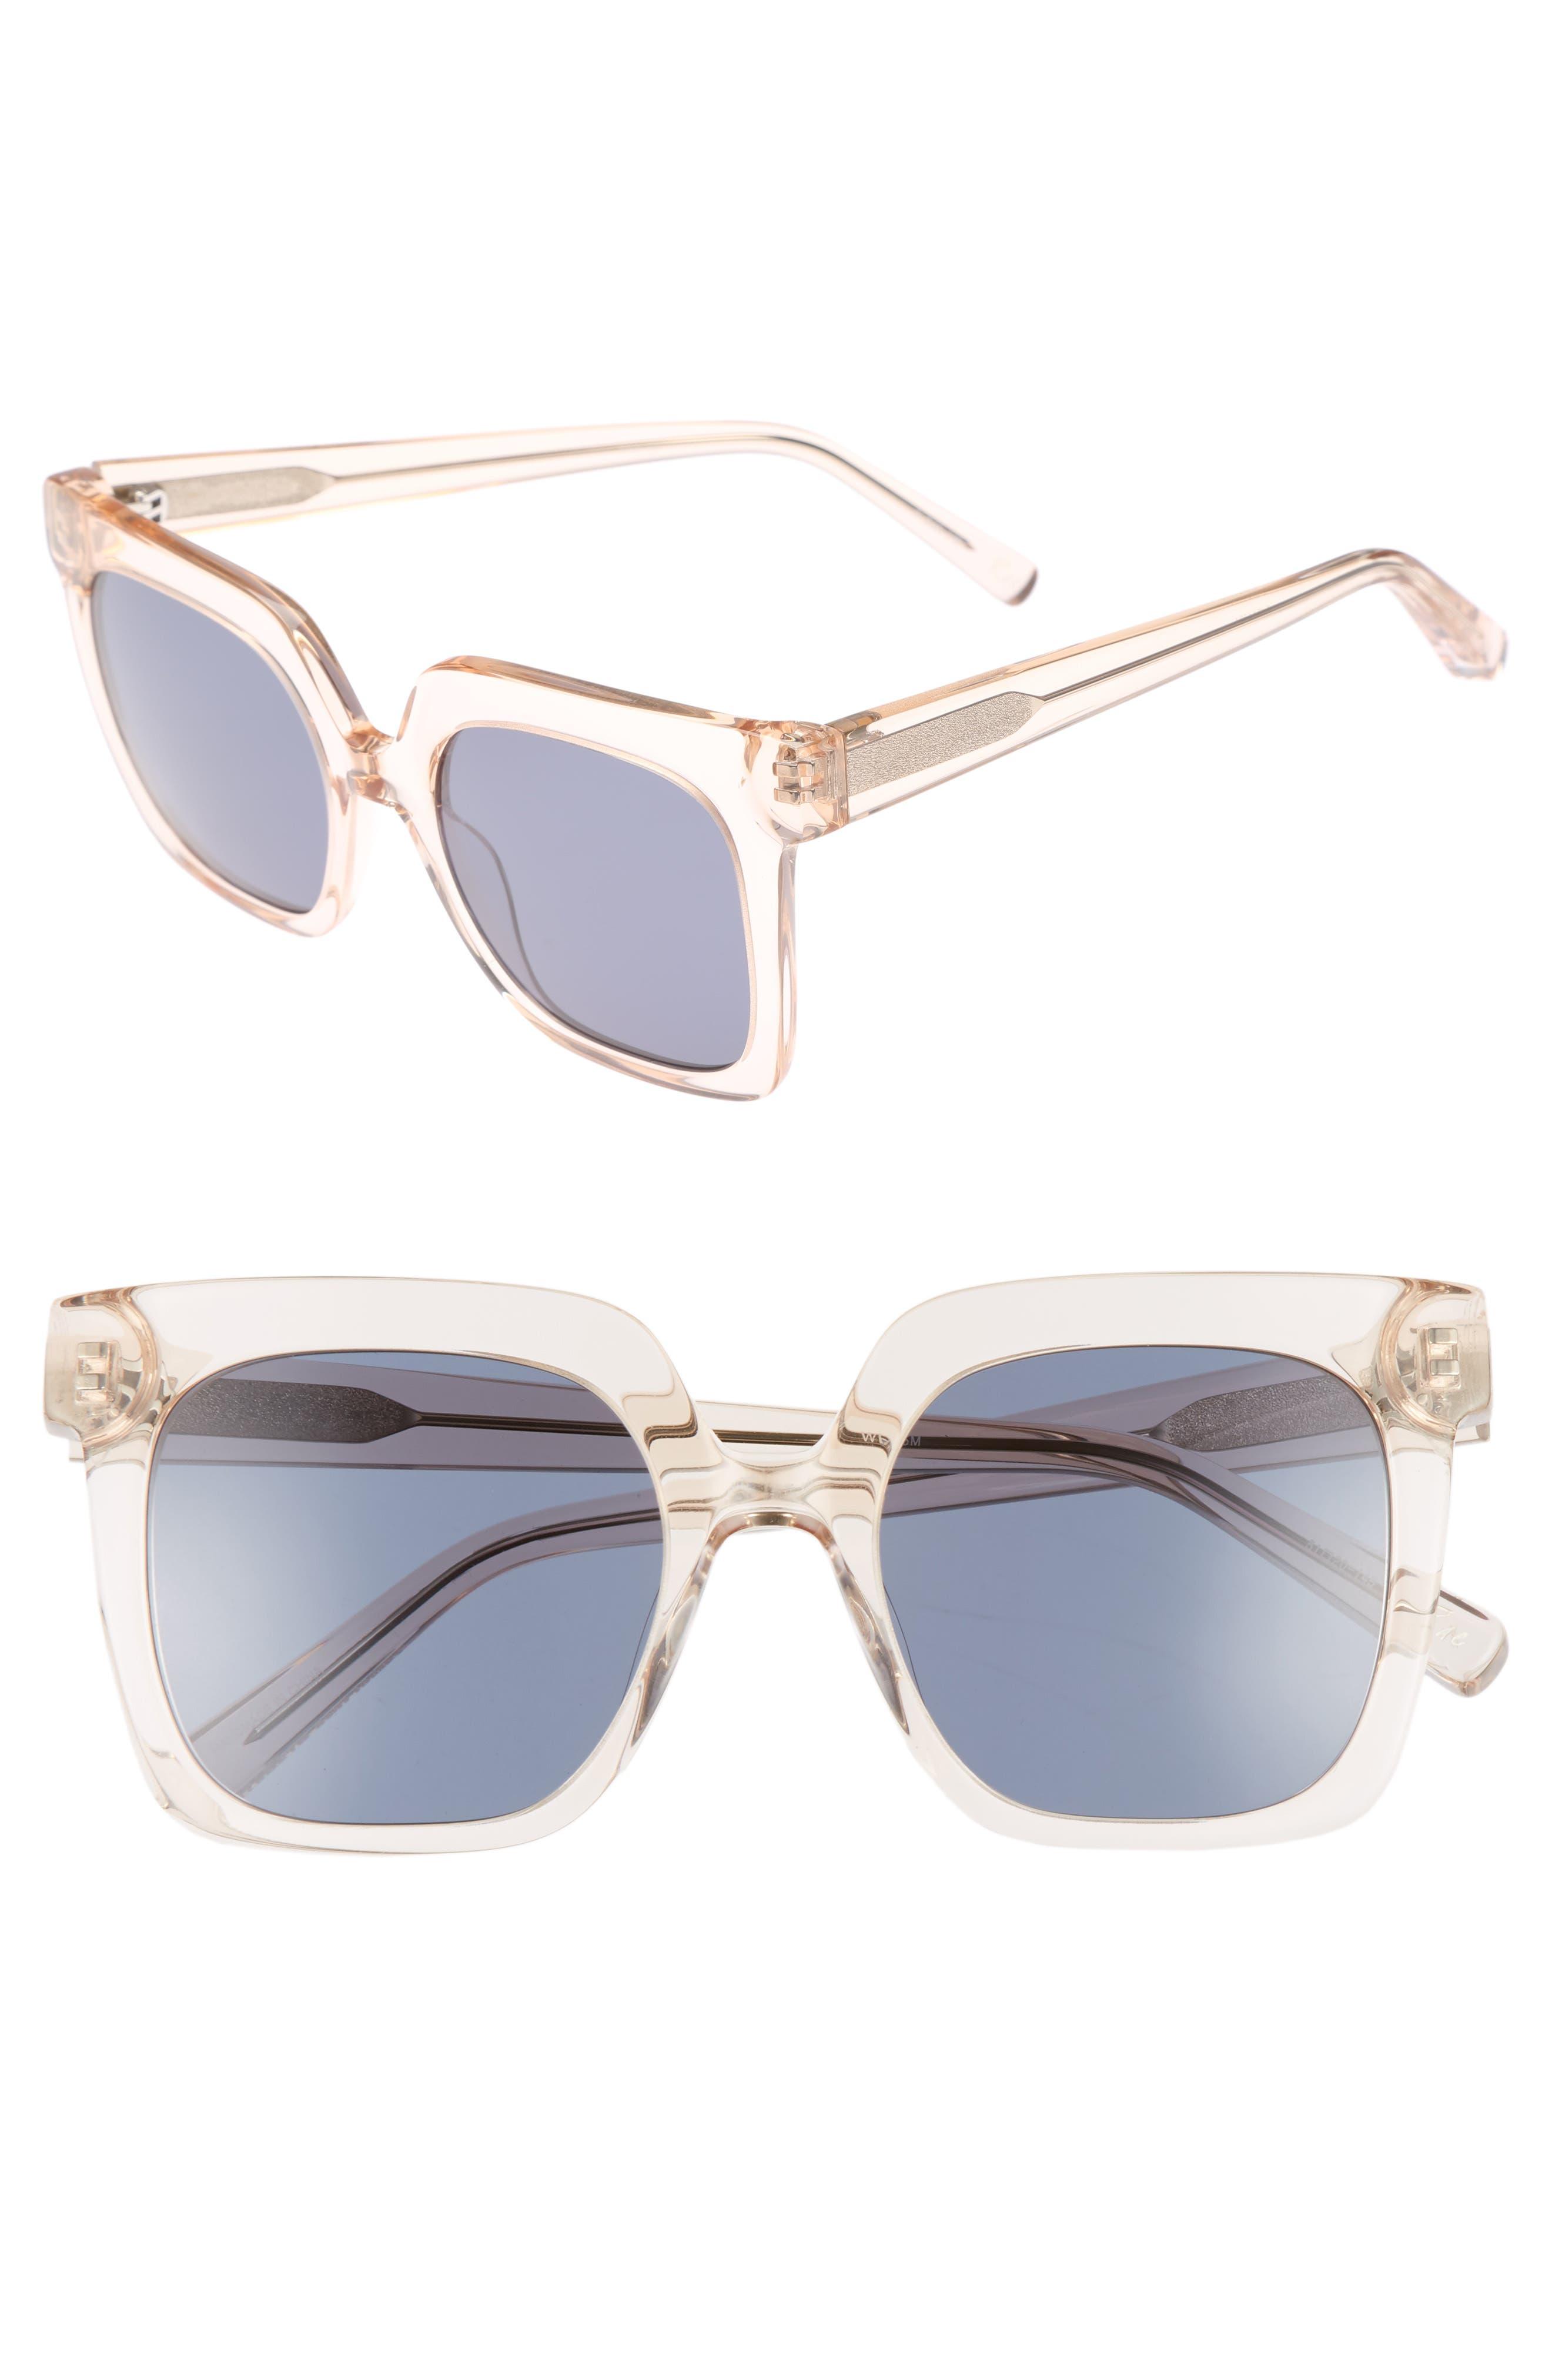 Rae 51mm Square Sunglasses,                         Main,                         color, Crystal Tea